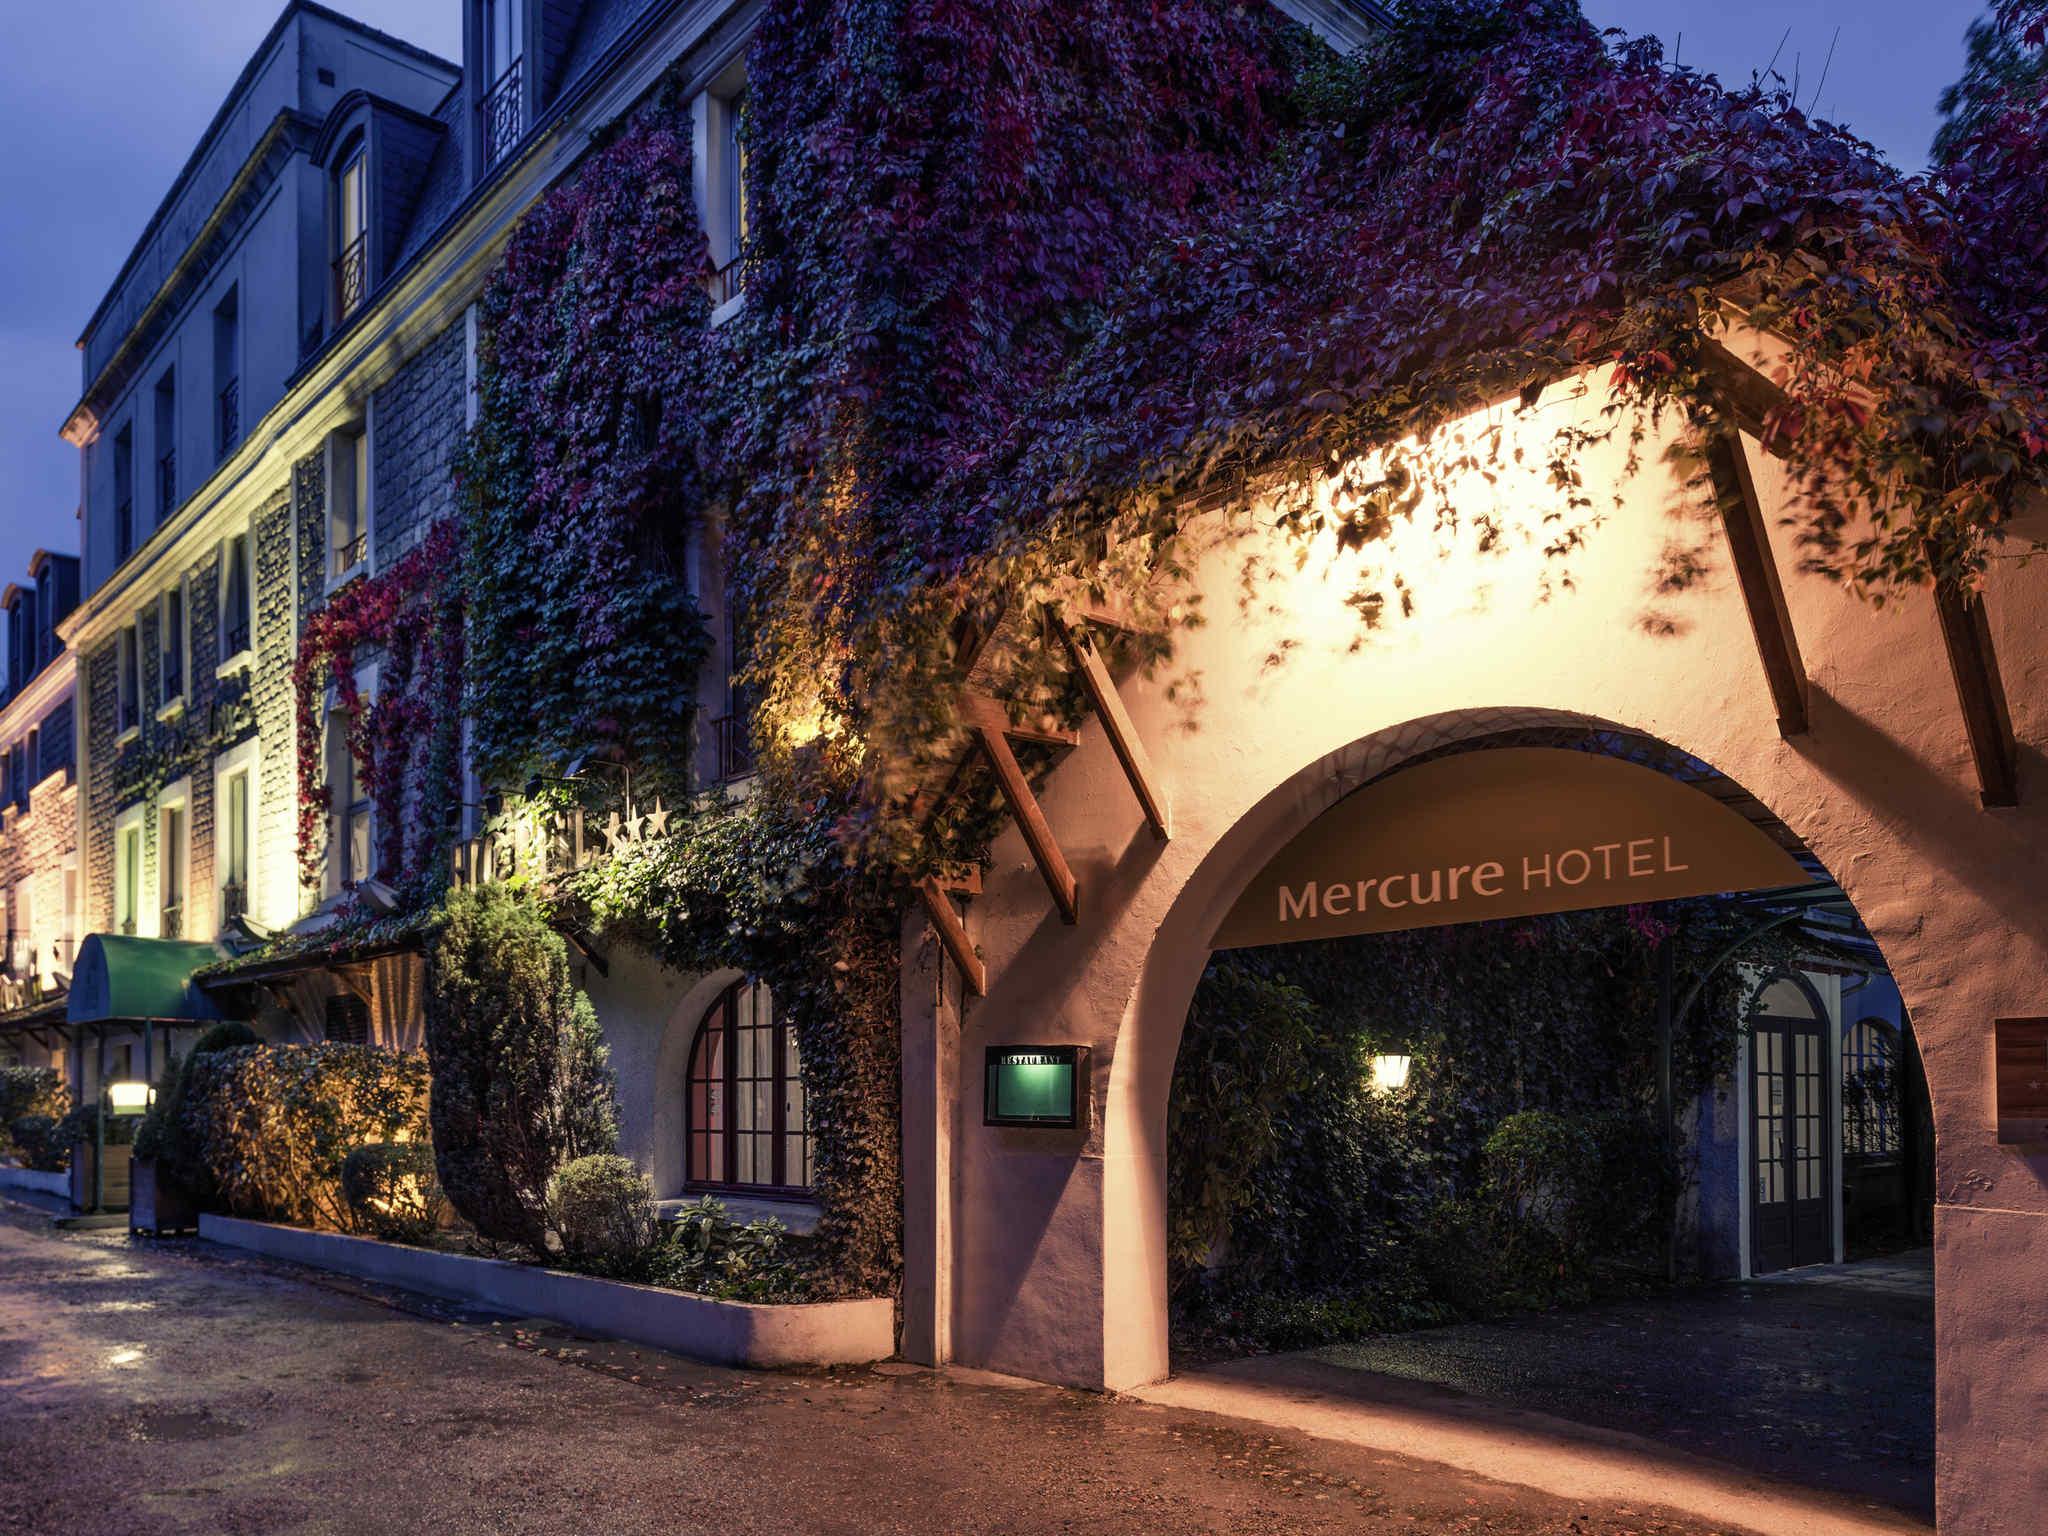 ホテル – Hôtel Mercure Paris Ouest Saint-Germain